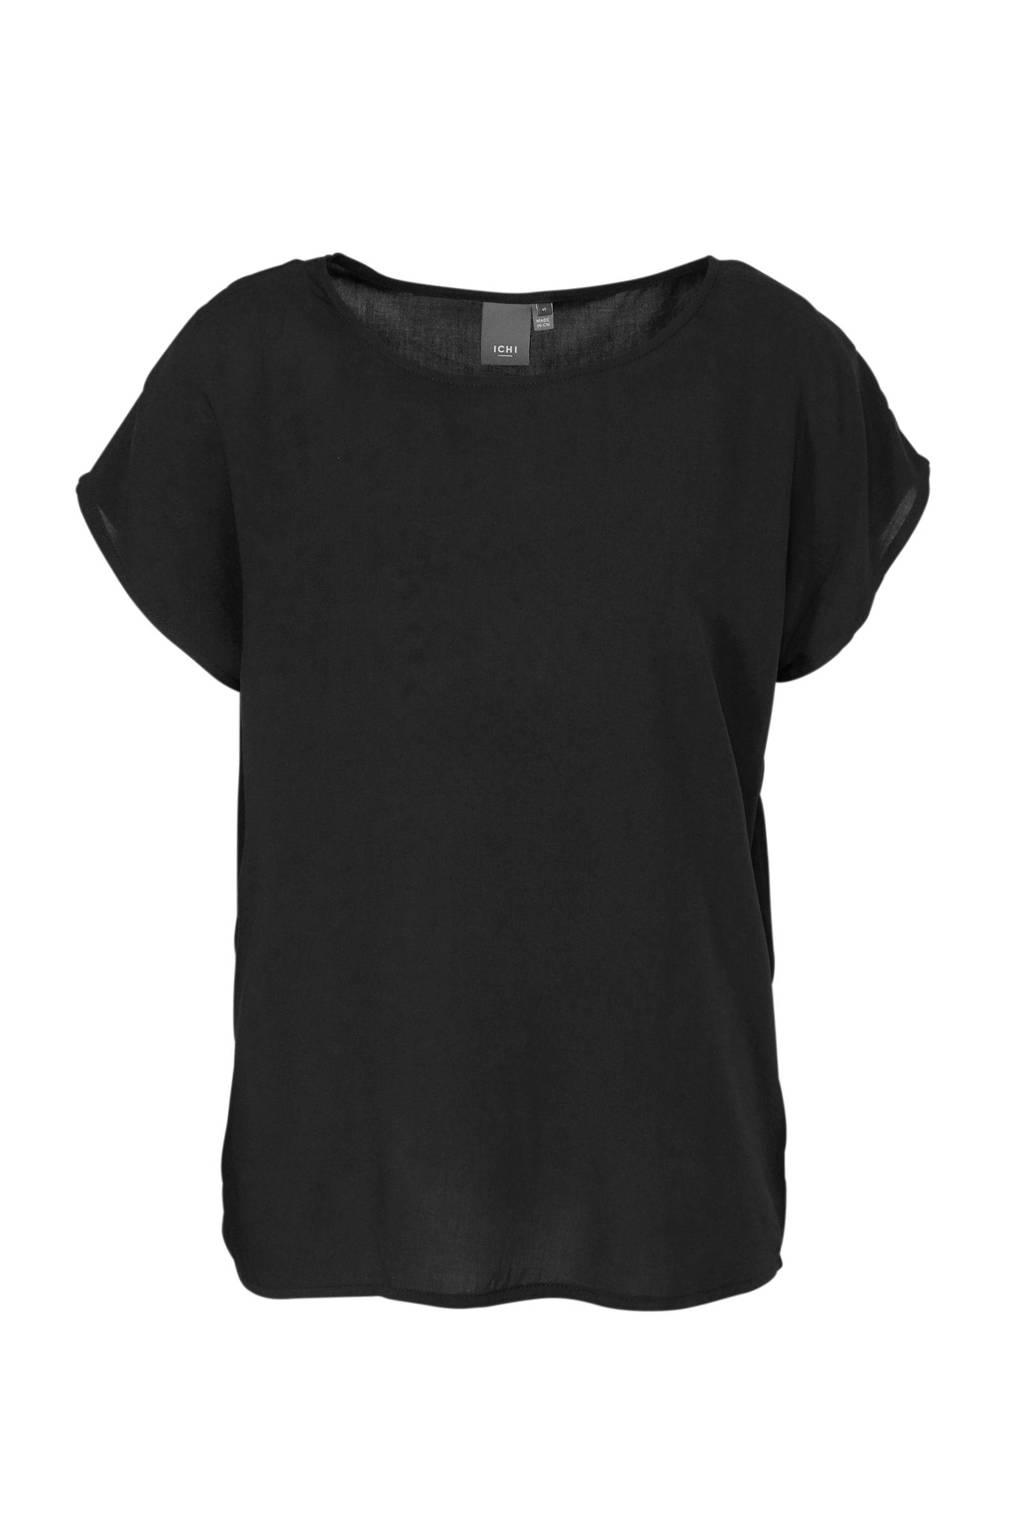 ICHI T-shirt zwart, Zwart